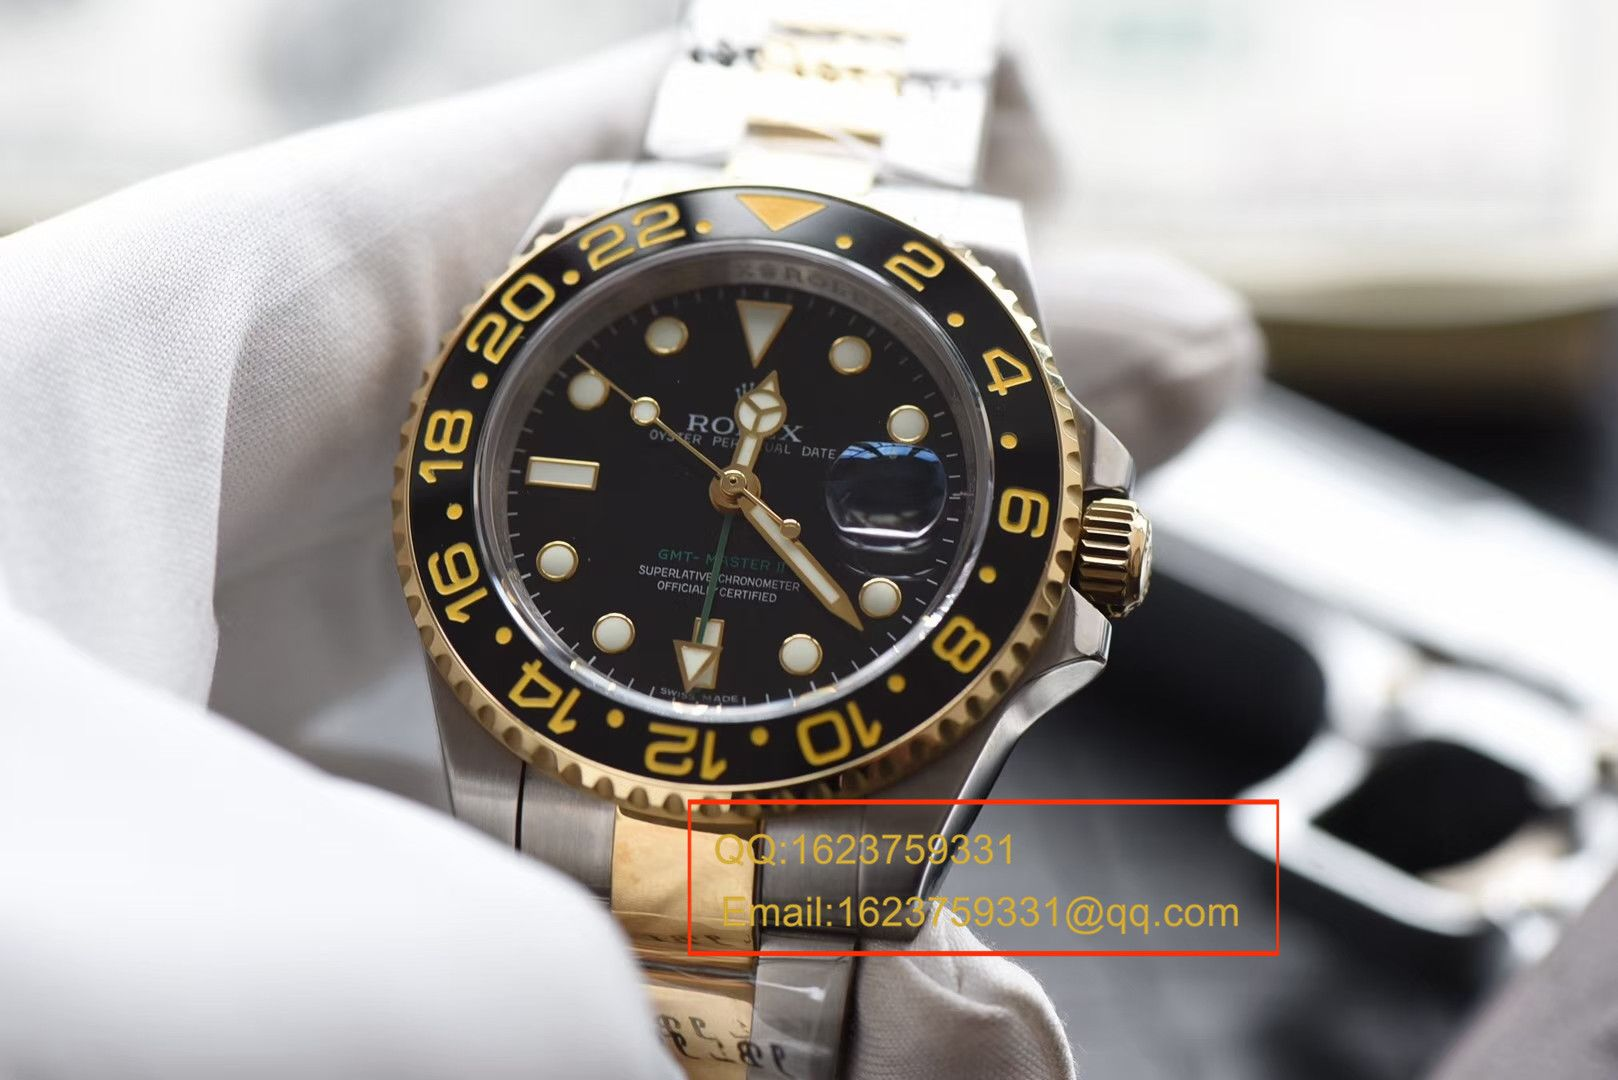 【N厂V7版本一比一精仿手表】劳力士格林尼治型II系列116713-LN-78203腕表【可选择包金款】 / RBF132